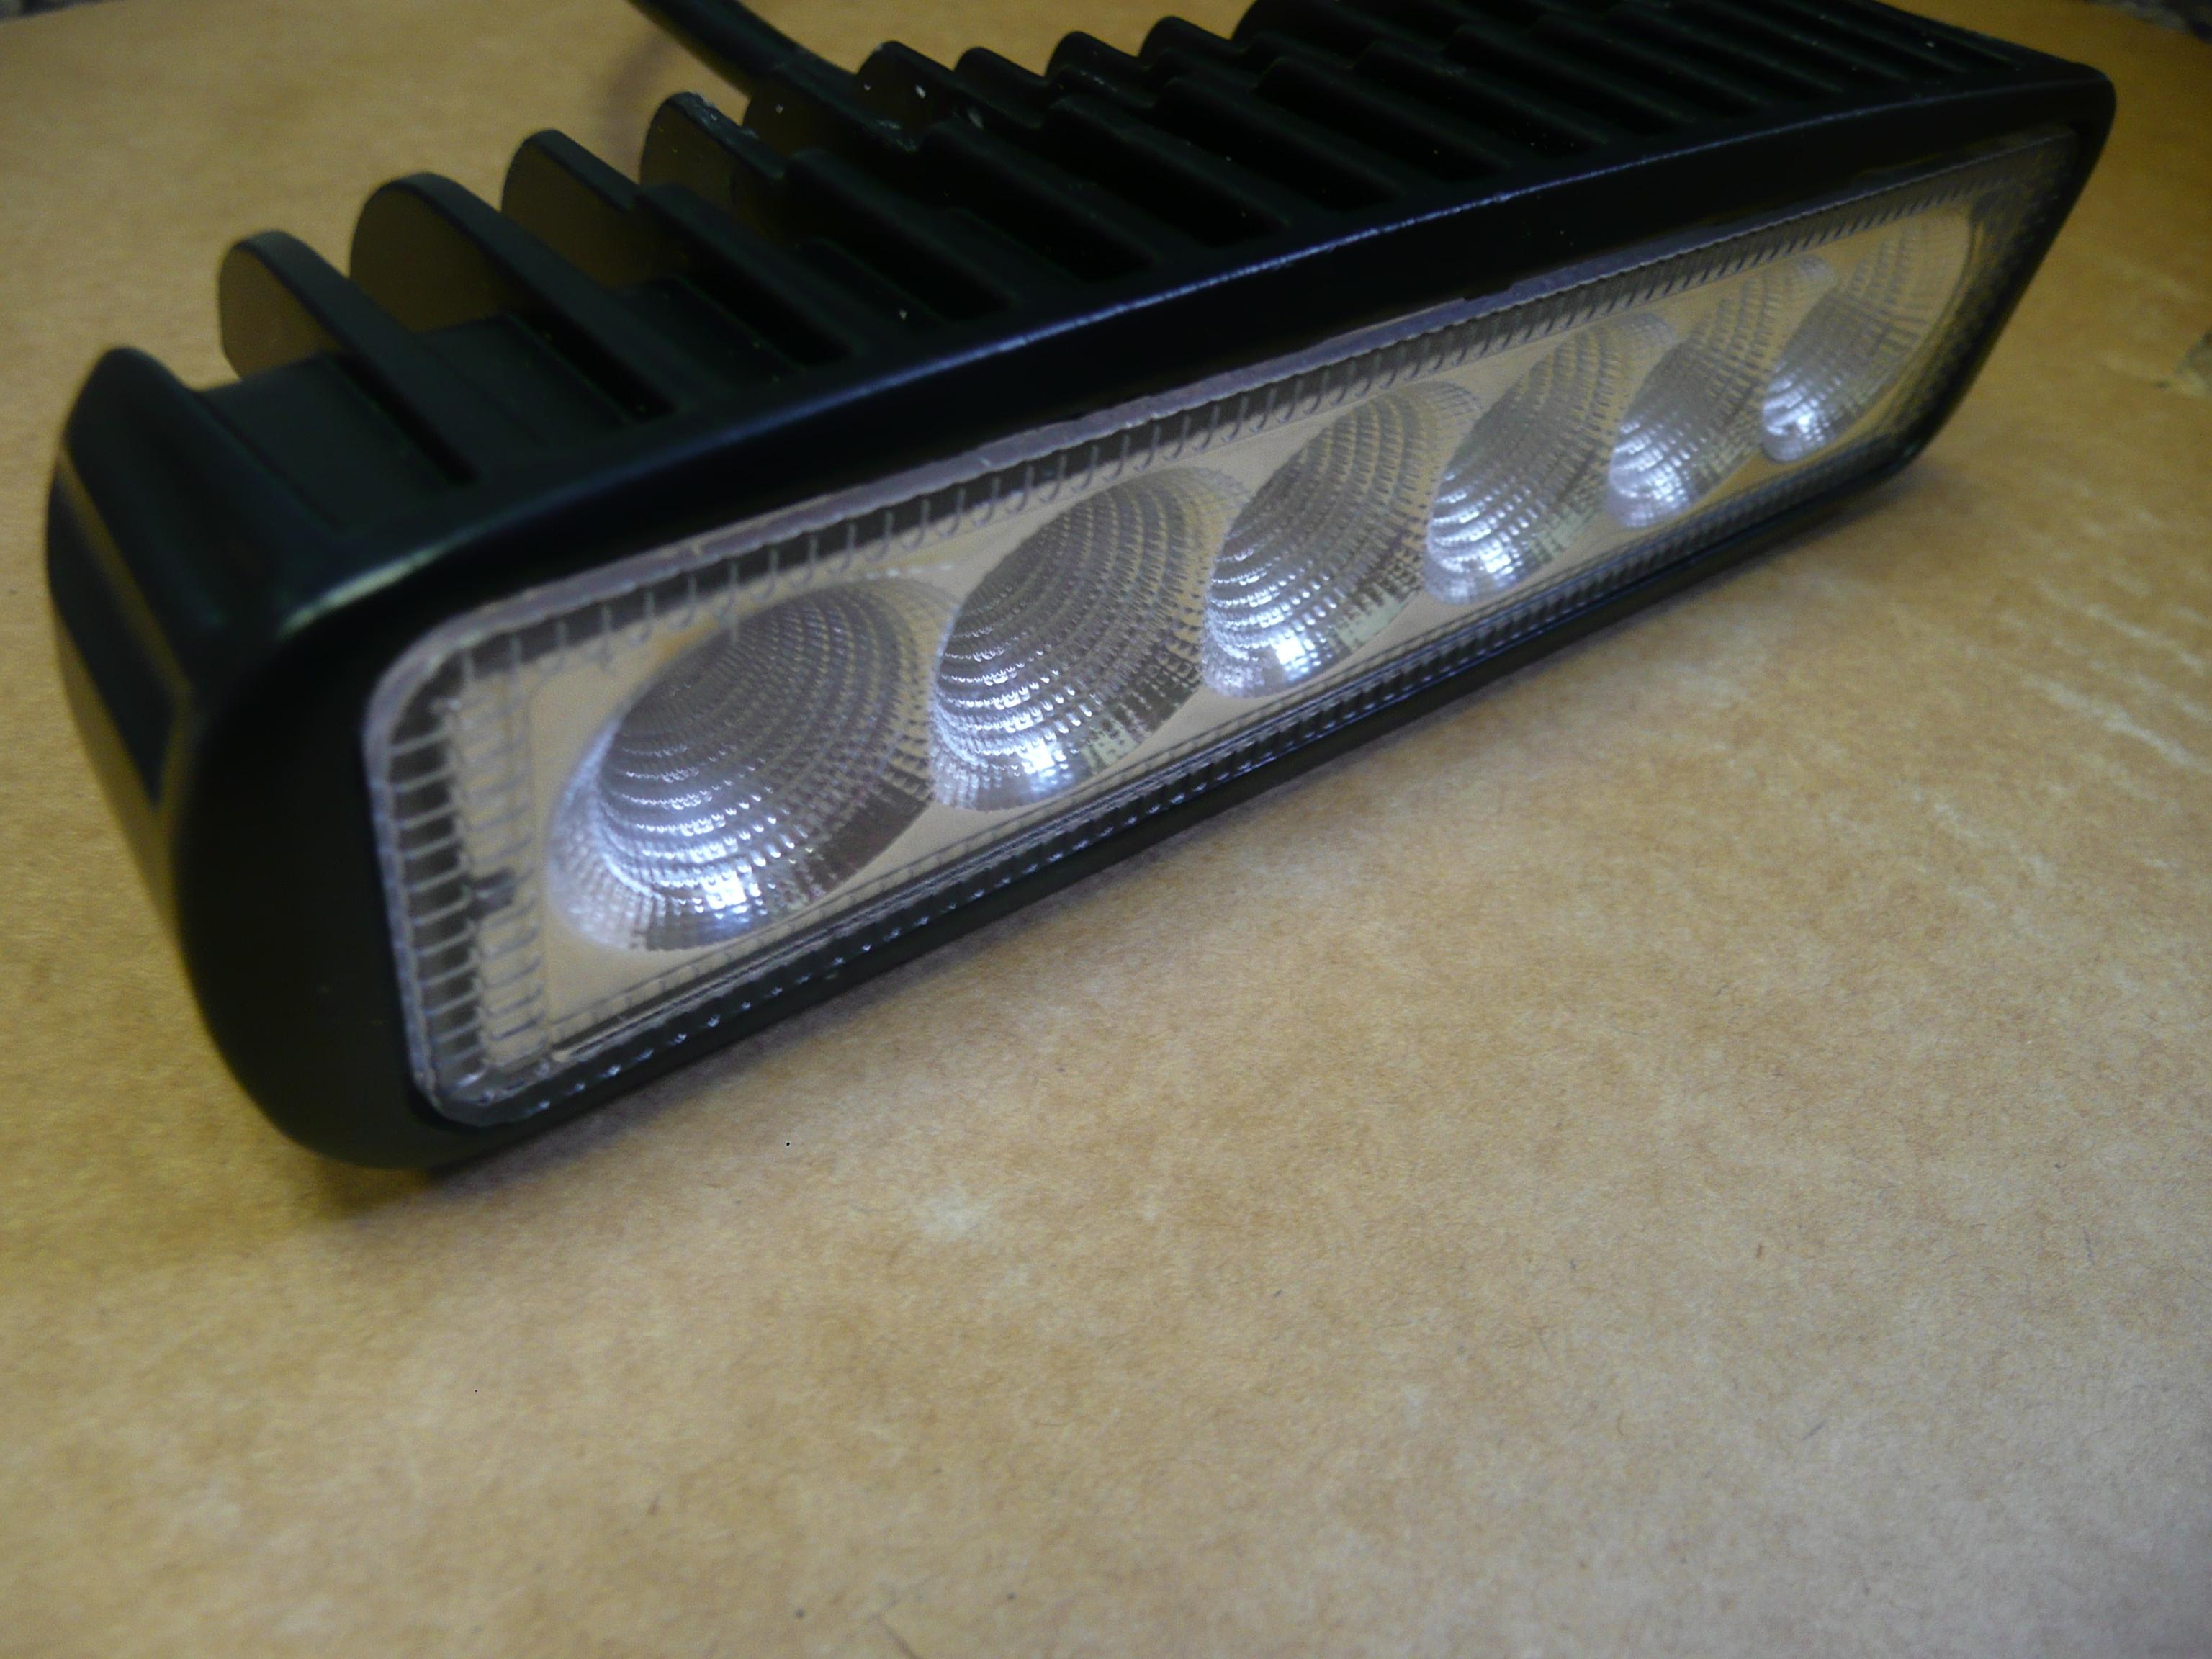 18W CREE LED Light Modules (Flood)